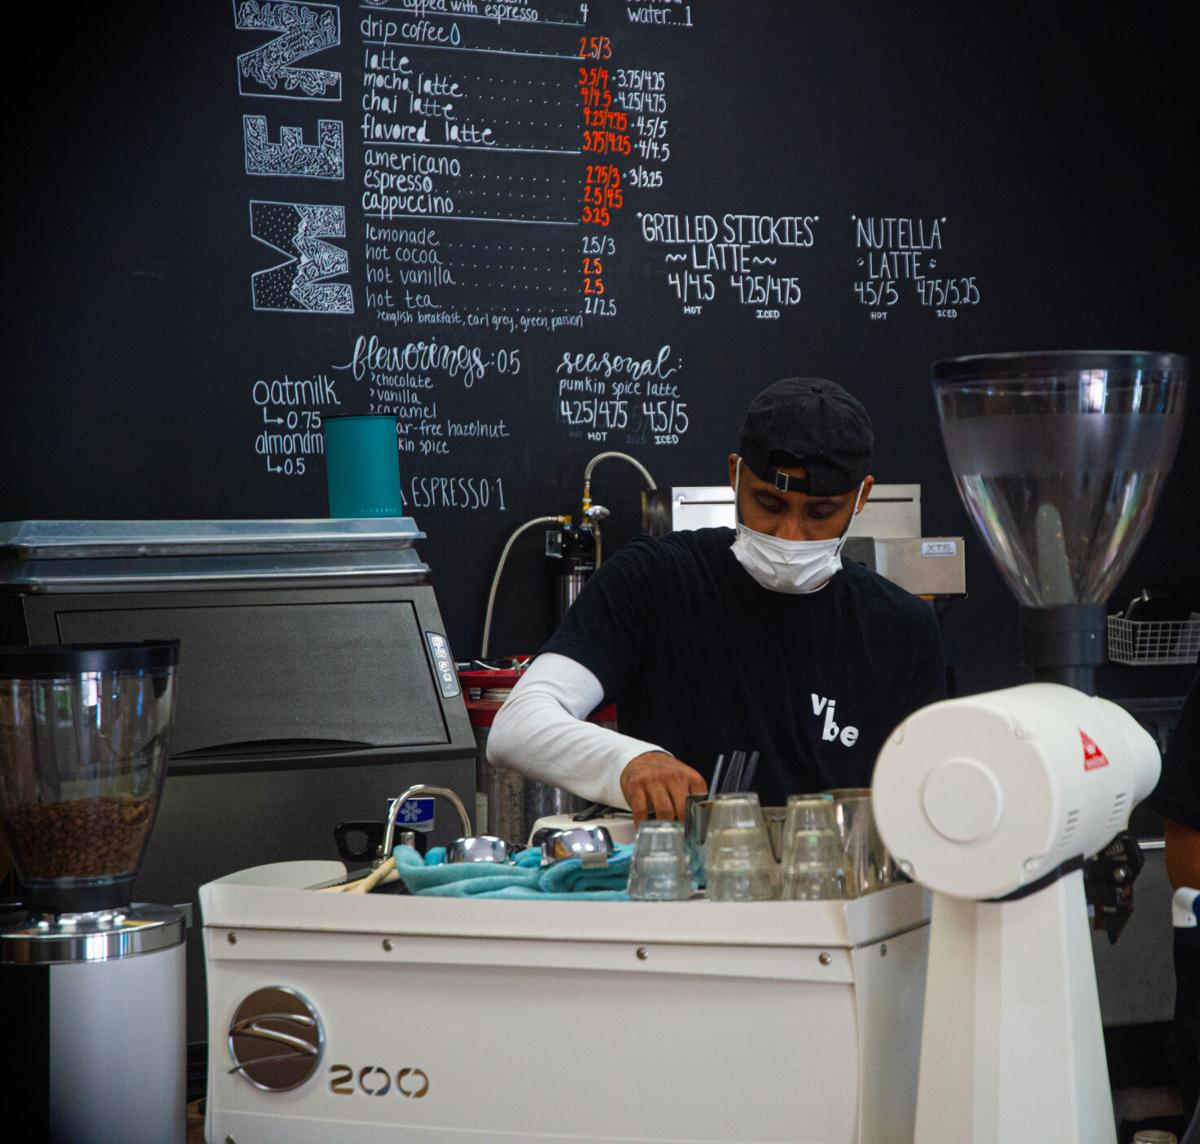 Vibe Coffee, barista